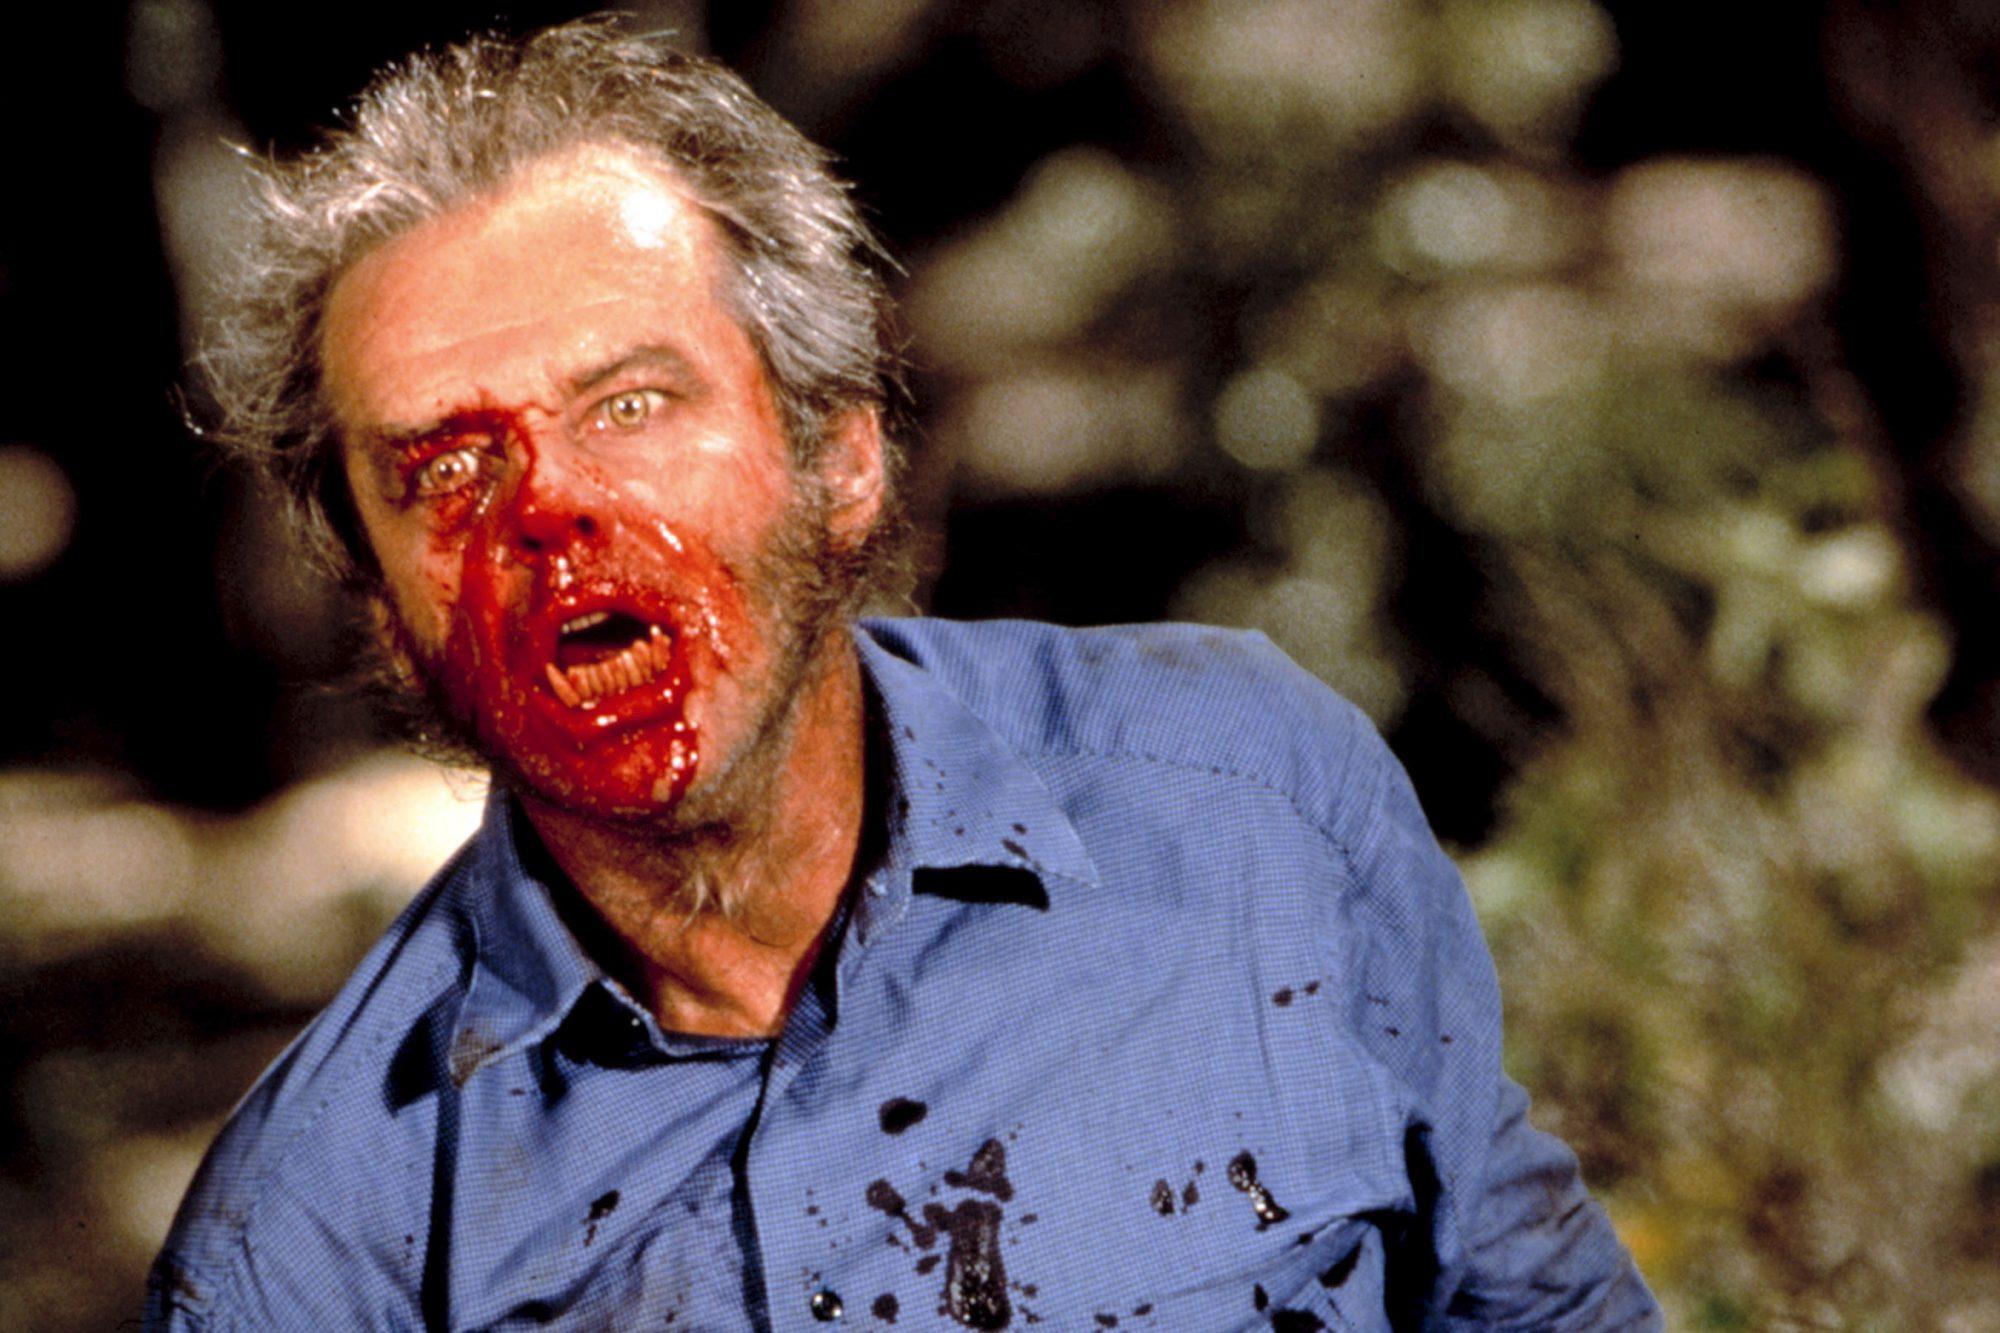 WOLF, Jack Nicholson, 1994